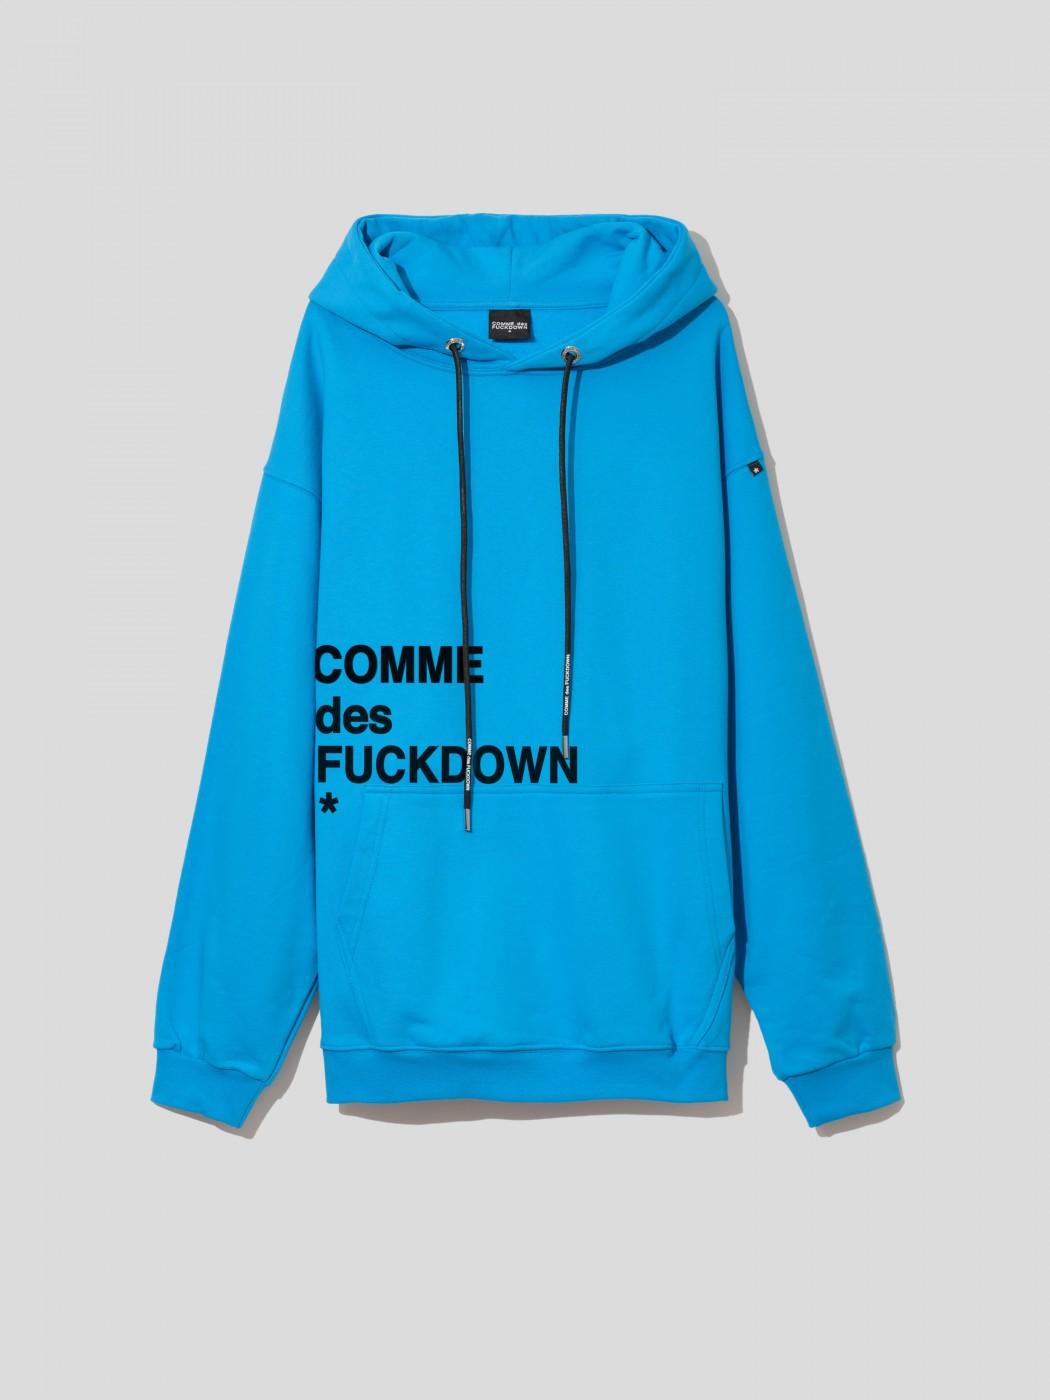 SWEATSHIRT - CDFU1251 - COMME DES FKDOWN